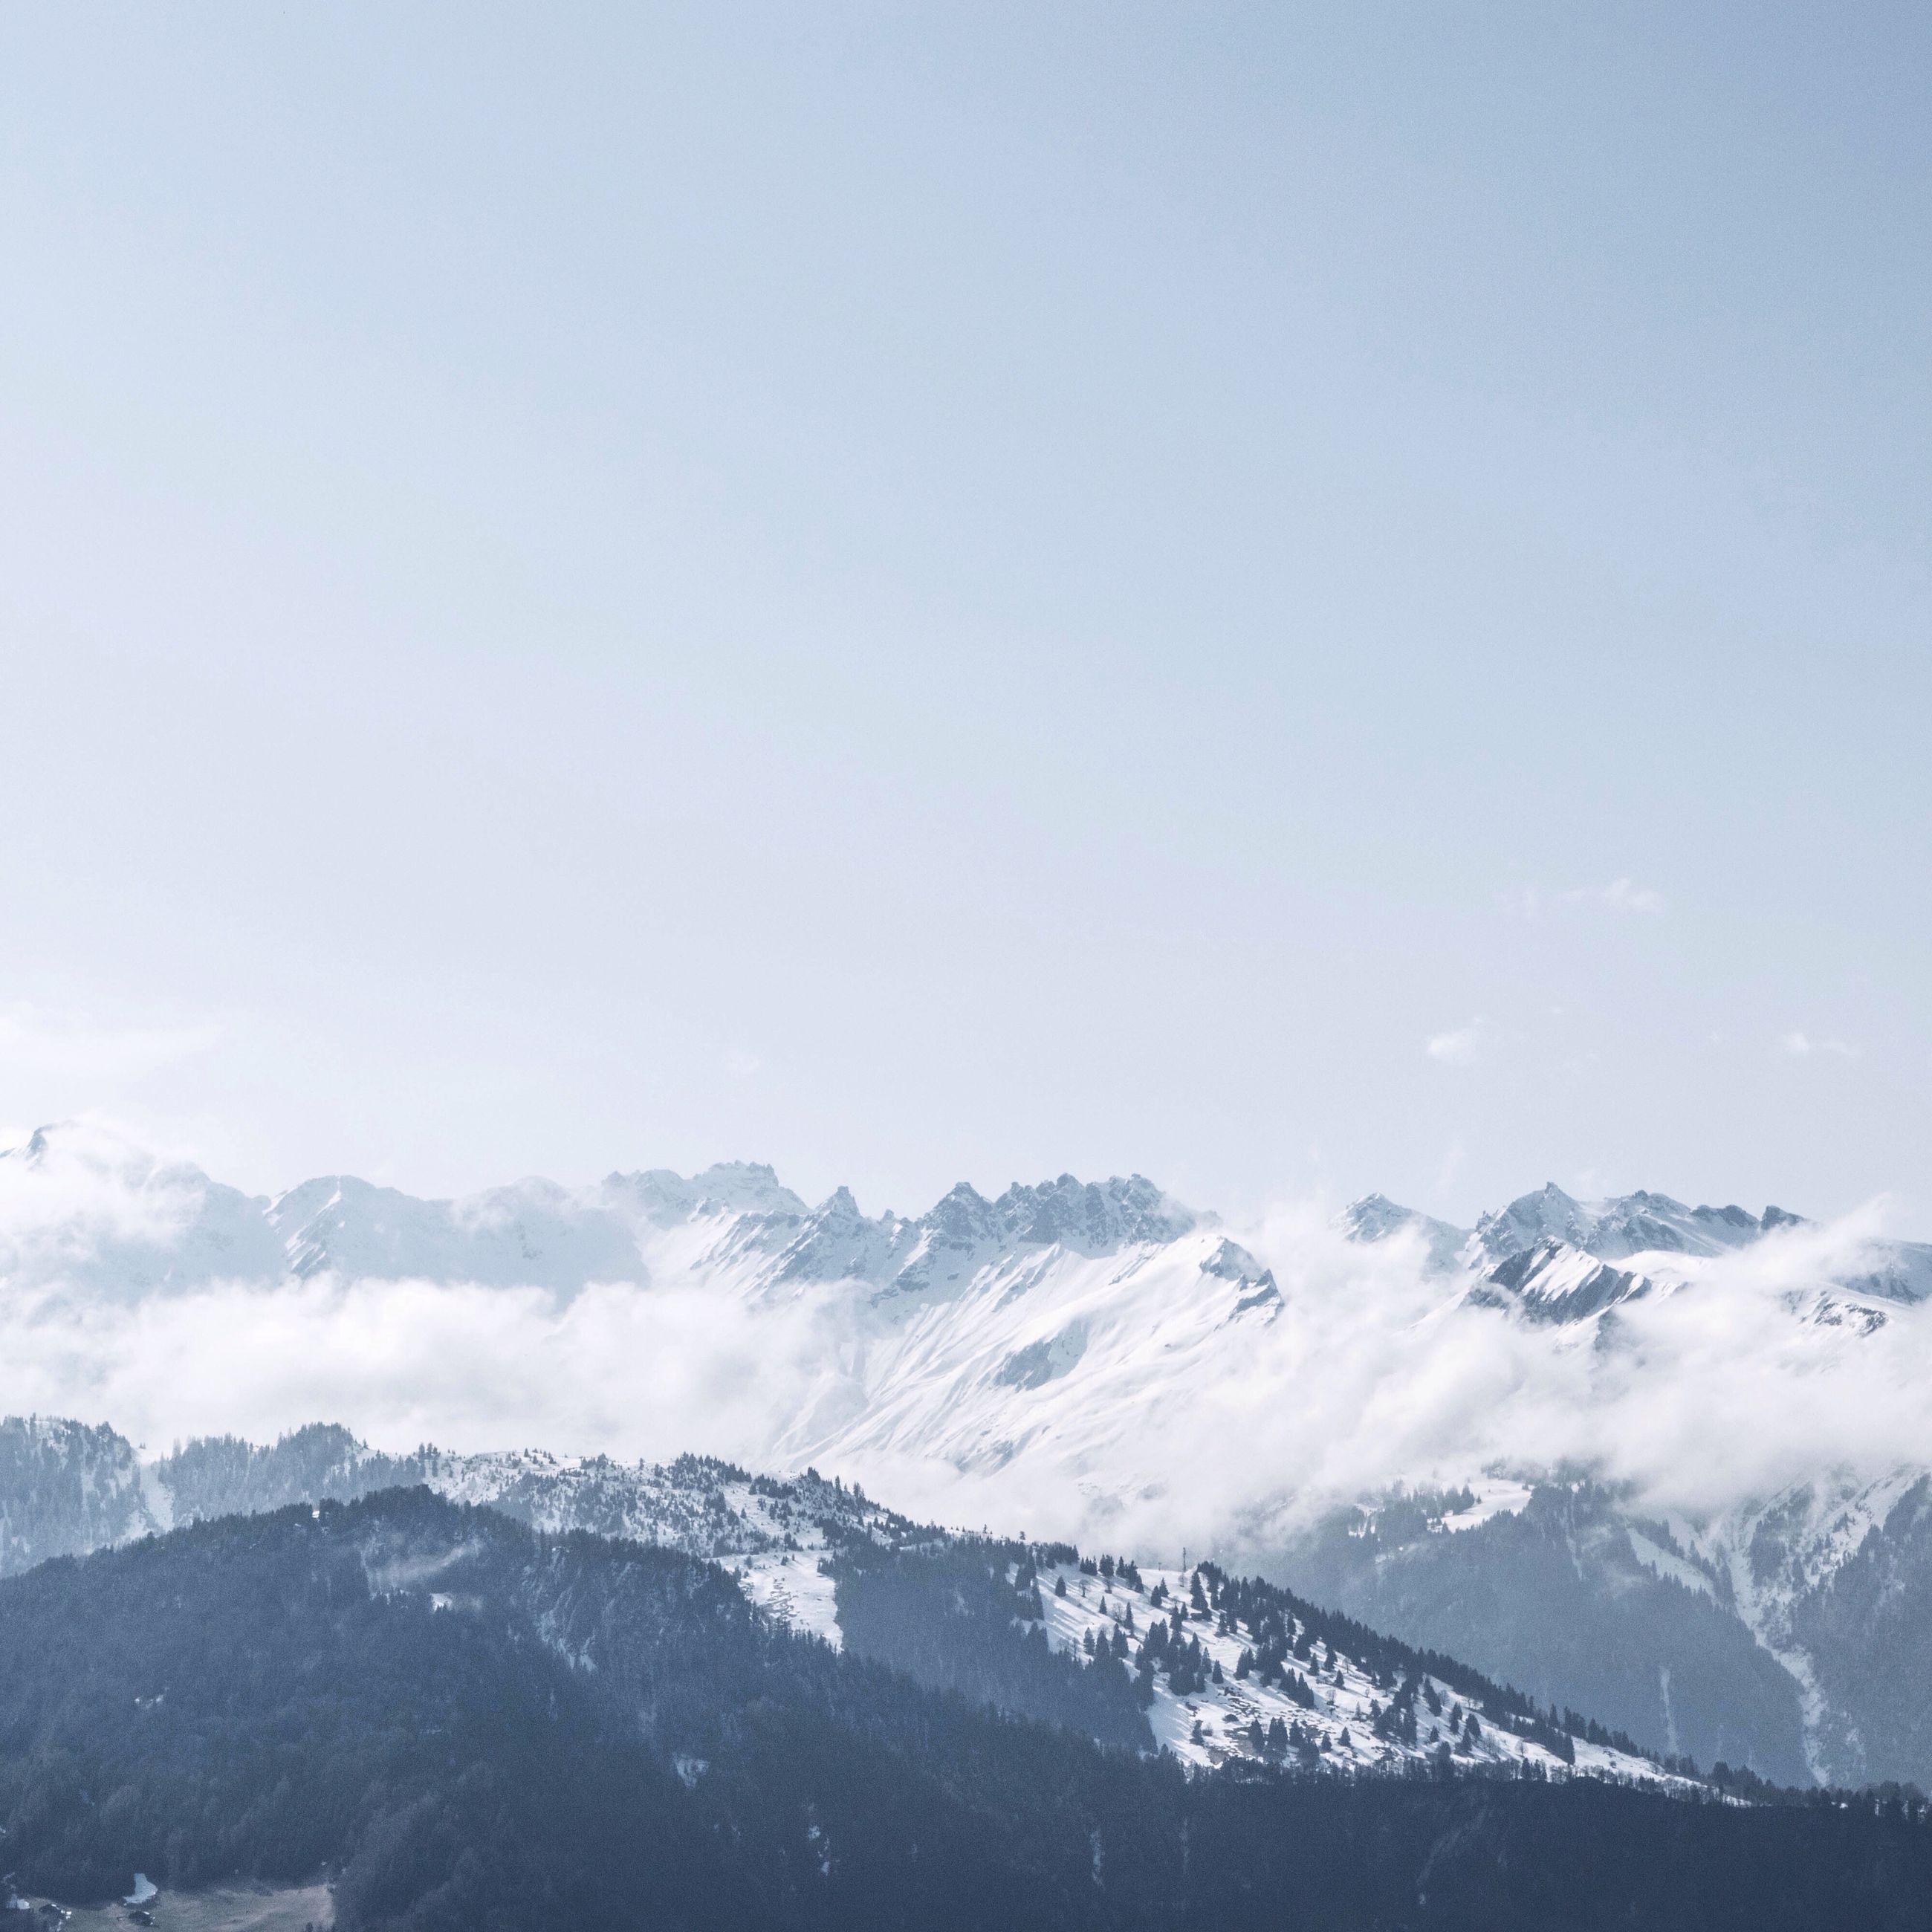 mountain, snow, winter, cold temperature, scenics, tranquil scene, mountain range, beauty in nature, tranquility, snowcapped mountain, weather, season, nature, copy space, clear sky, idyllic, landscape, majestic, non-urban scene, sky